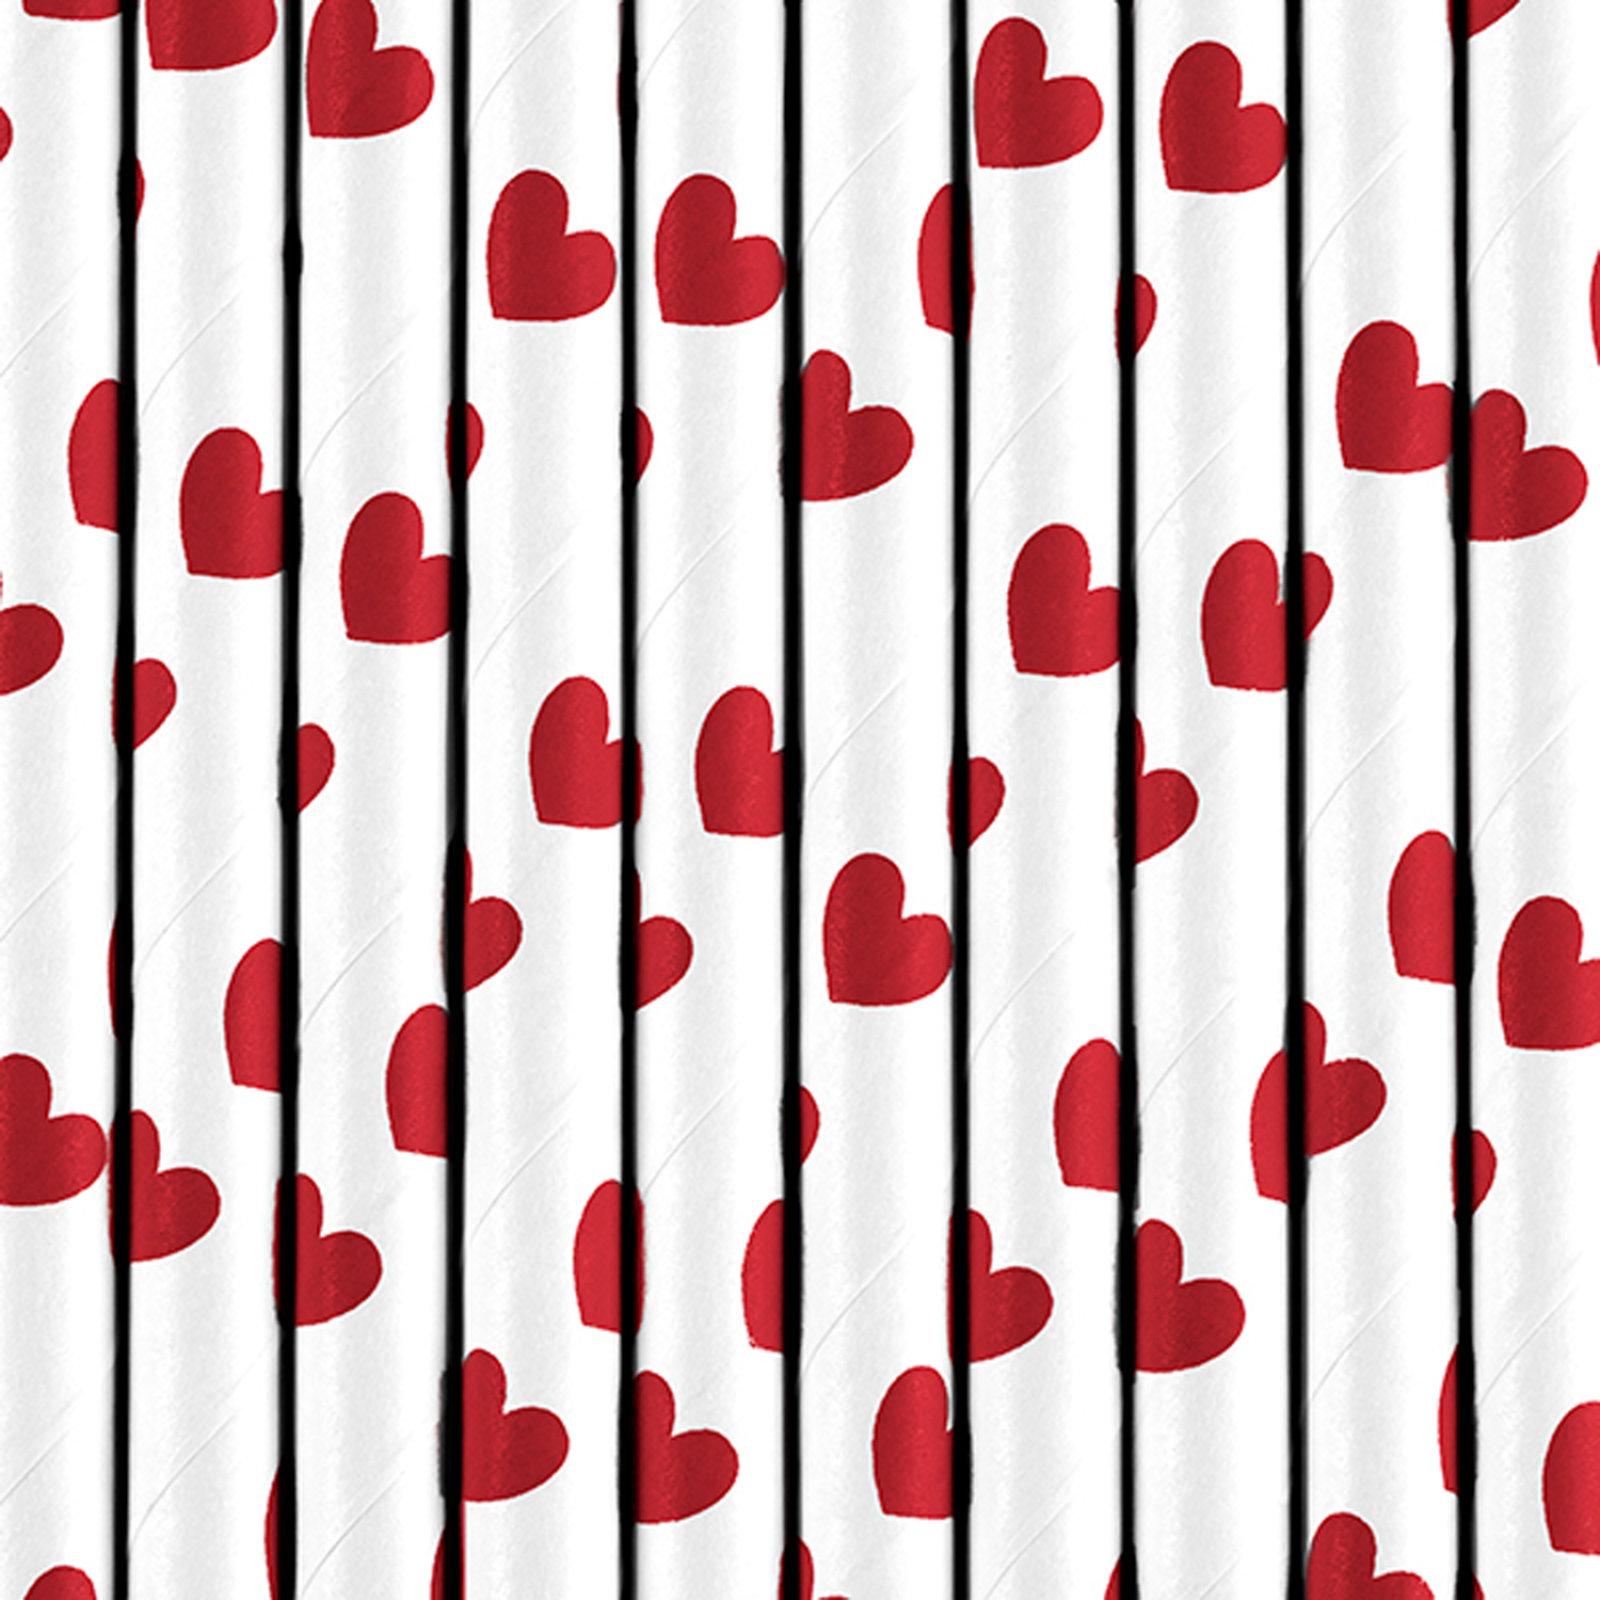 10 papier strohhalme rote herzen der ideen. Black Bedroom Furniture Sets. Home Design Ideas